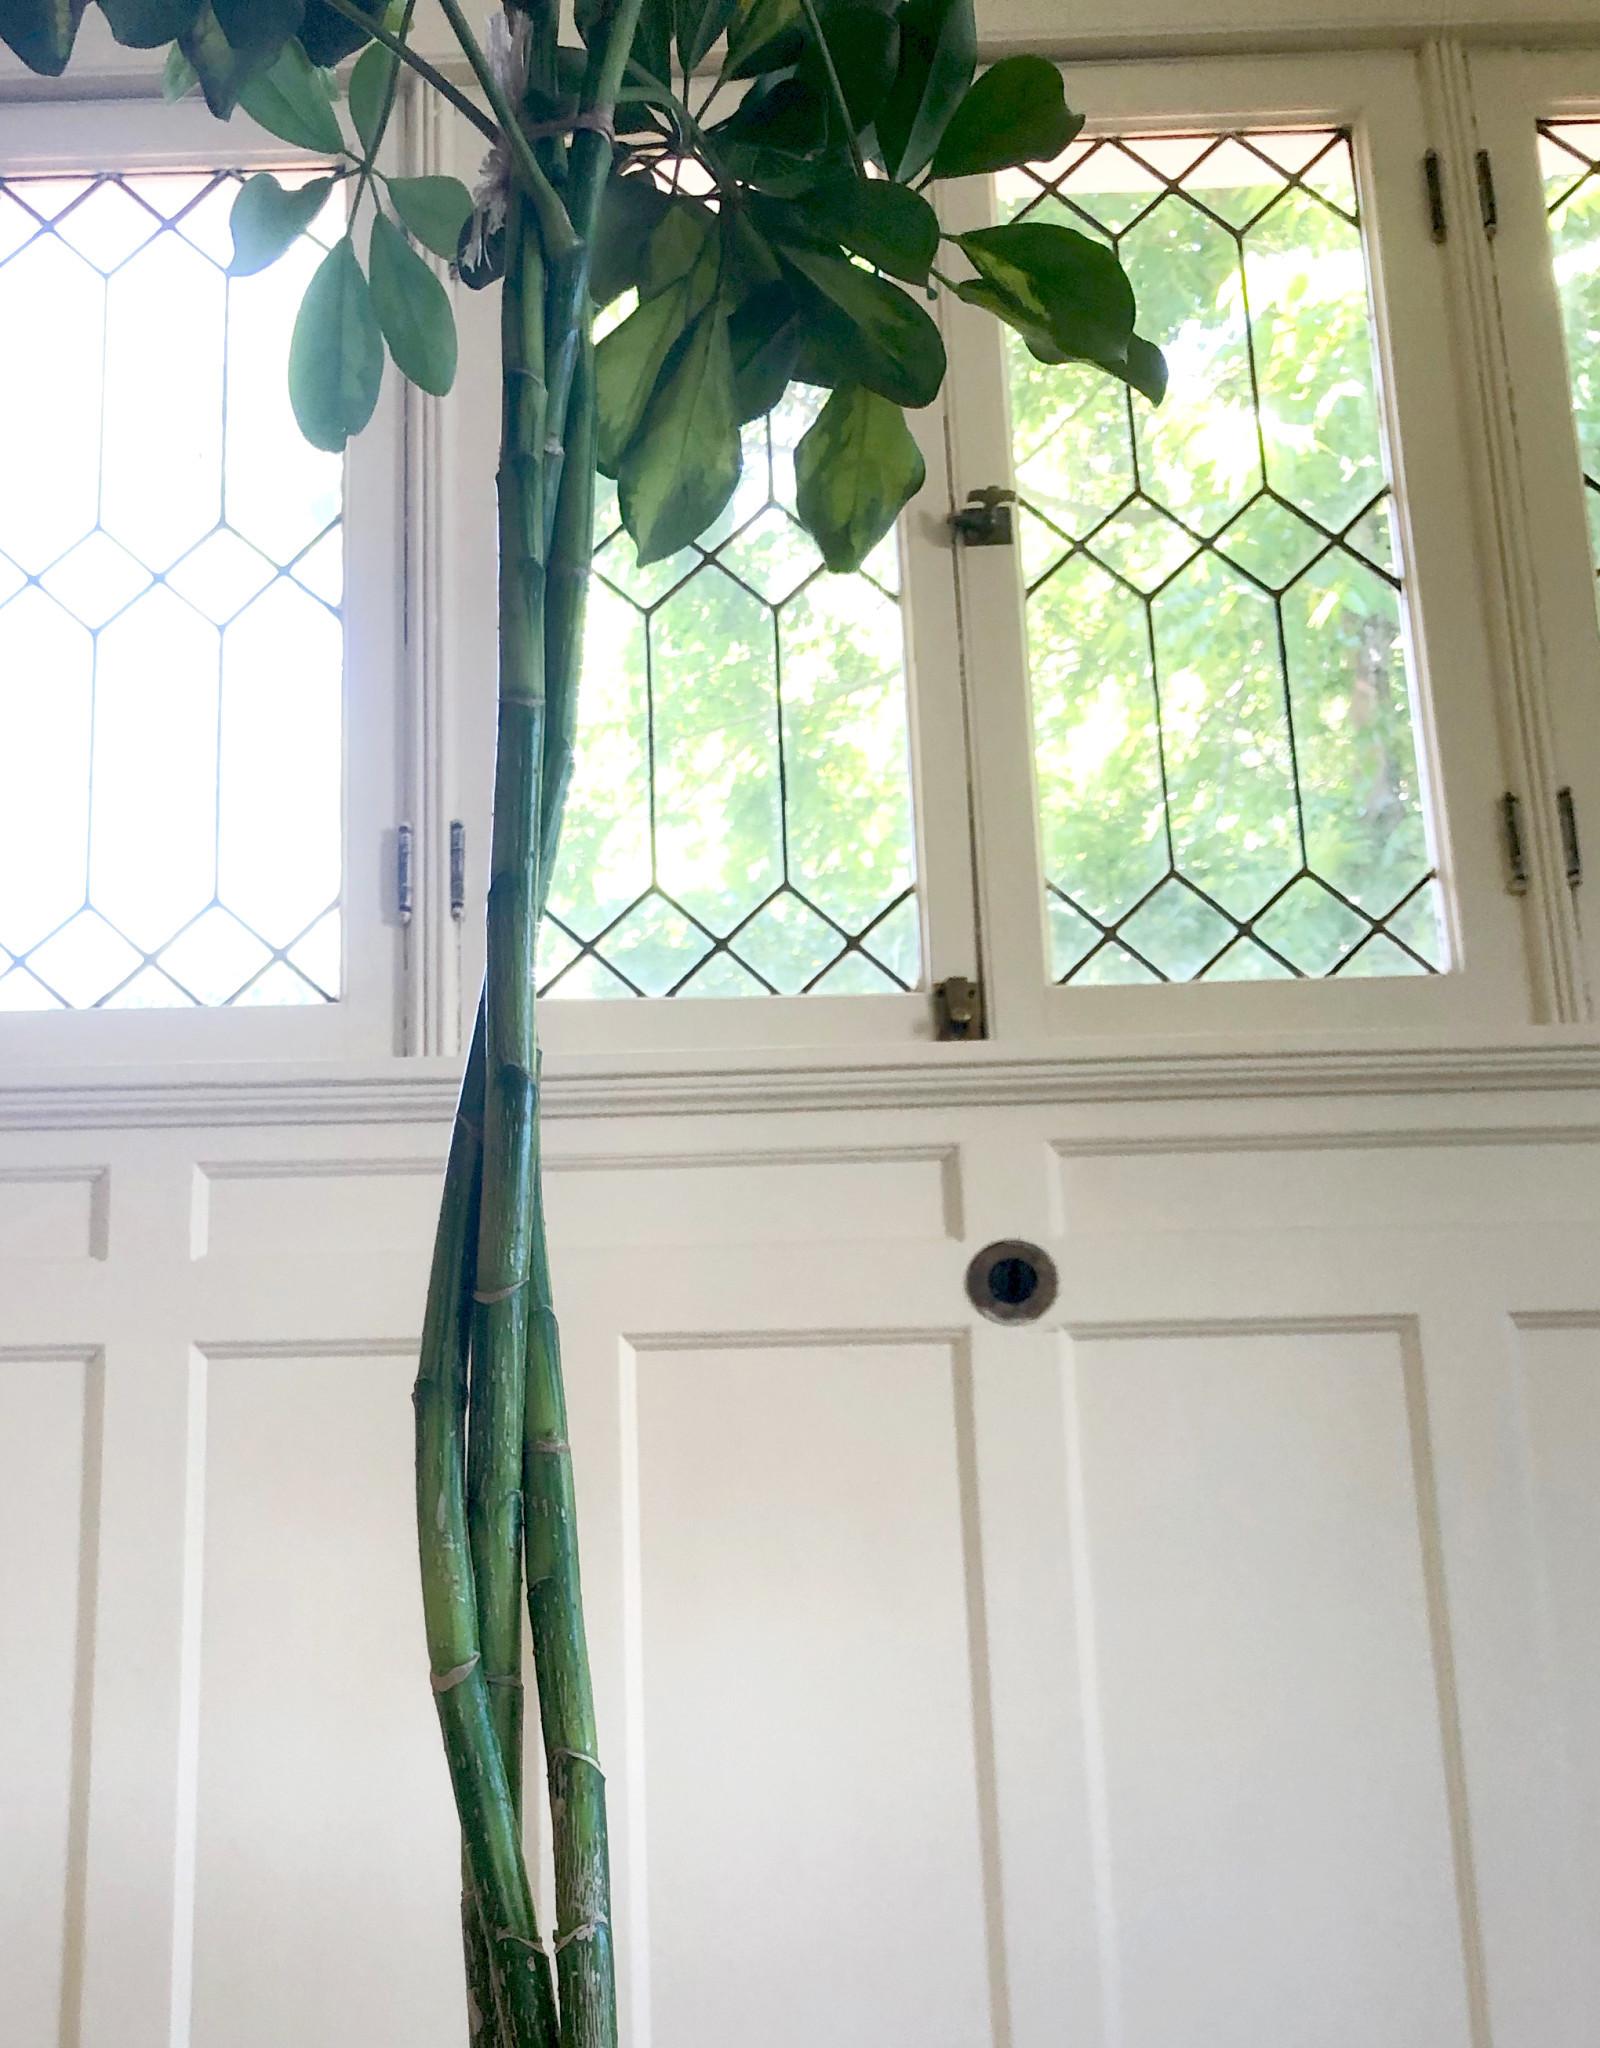 Curio Schefflera Arboricola 'Dwarf Umbrella Tree' Variegated